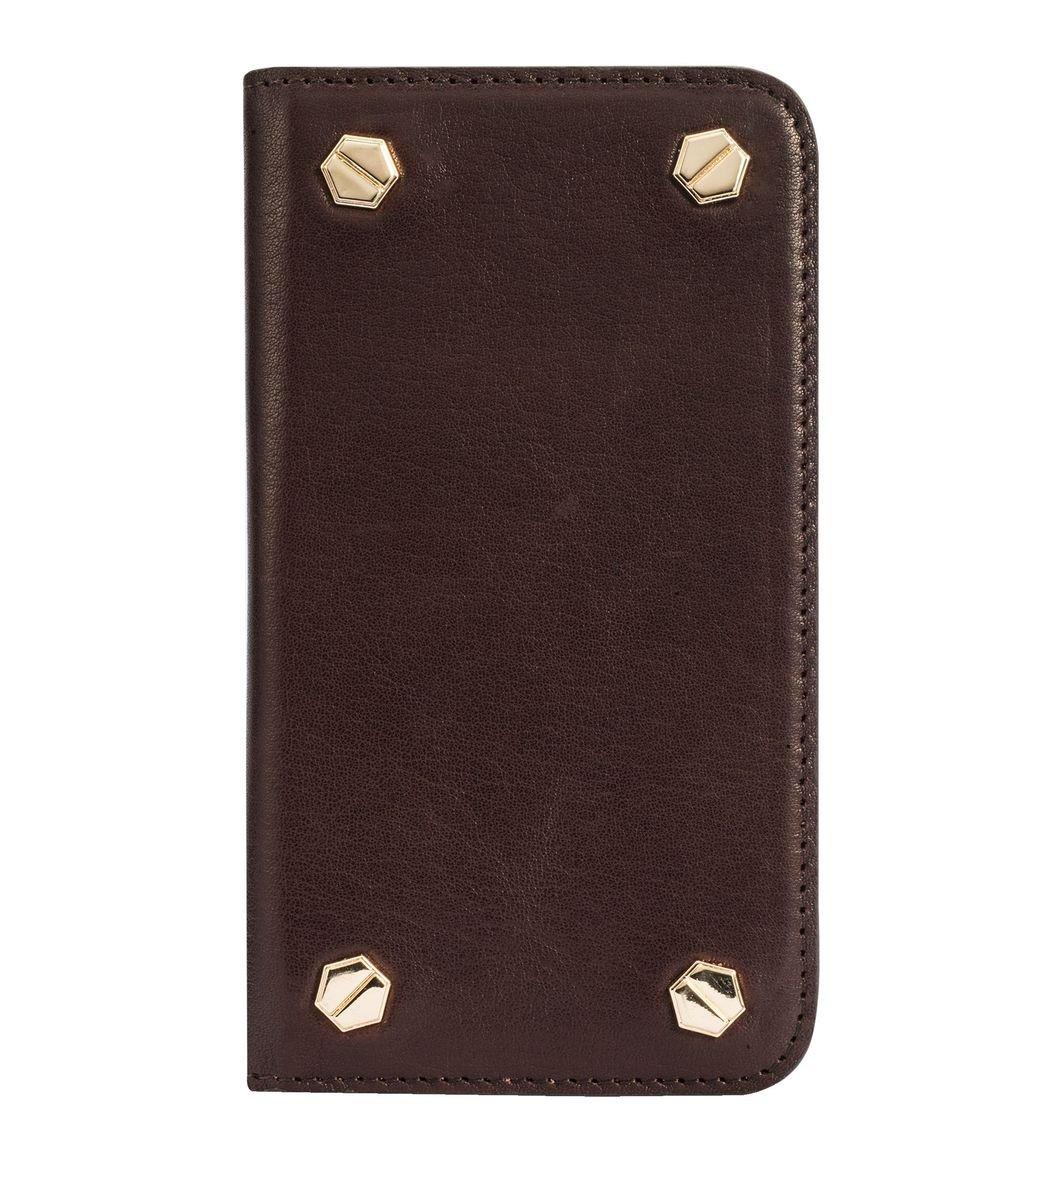 "Apple Iphone 6/6s (4.7"") Hex-shine系列義大利高級牛皮時尚手機套 (義大利咖啡色)"